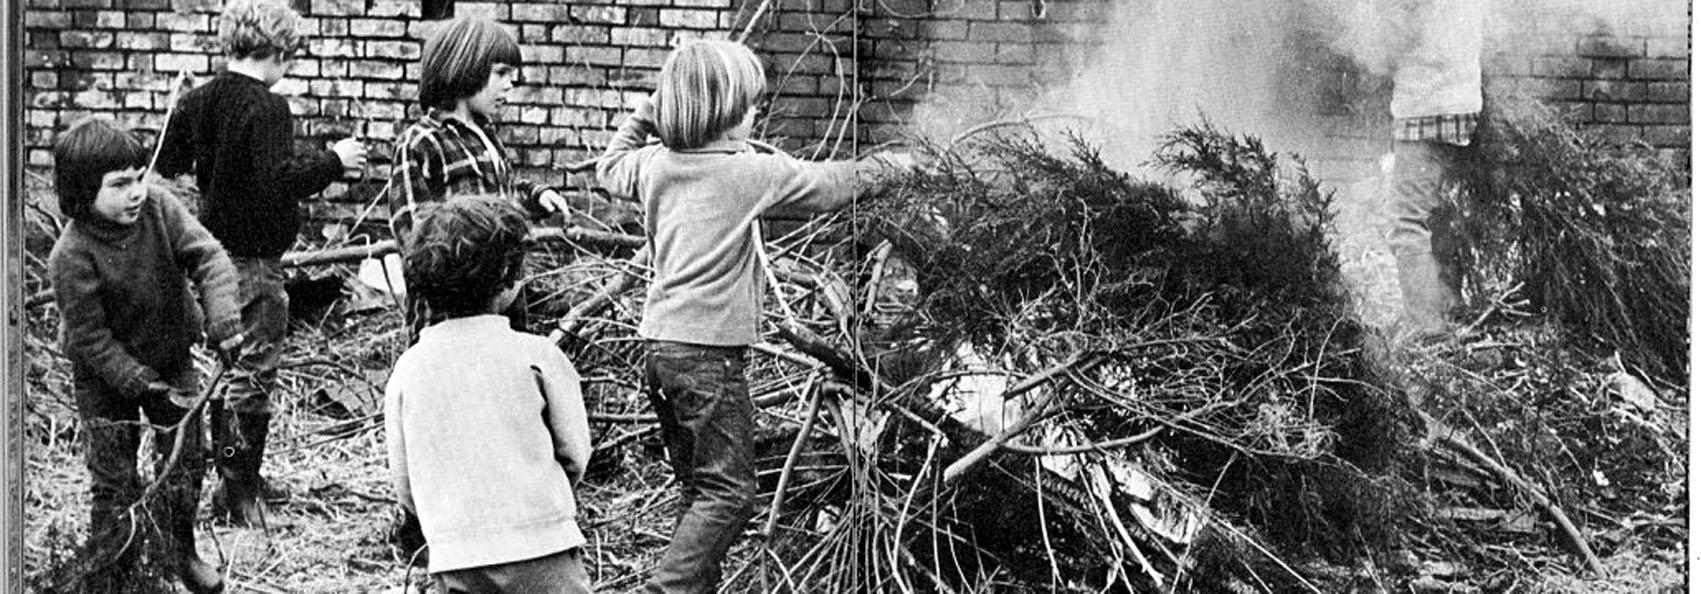 enfants de summerhill faire un feu